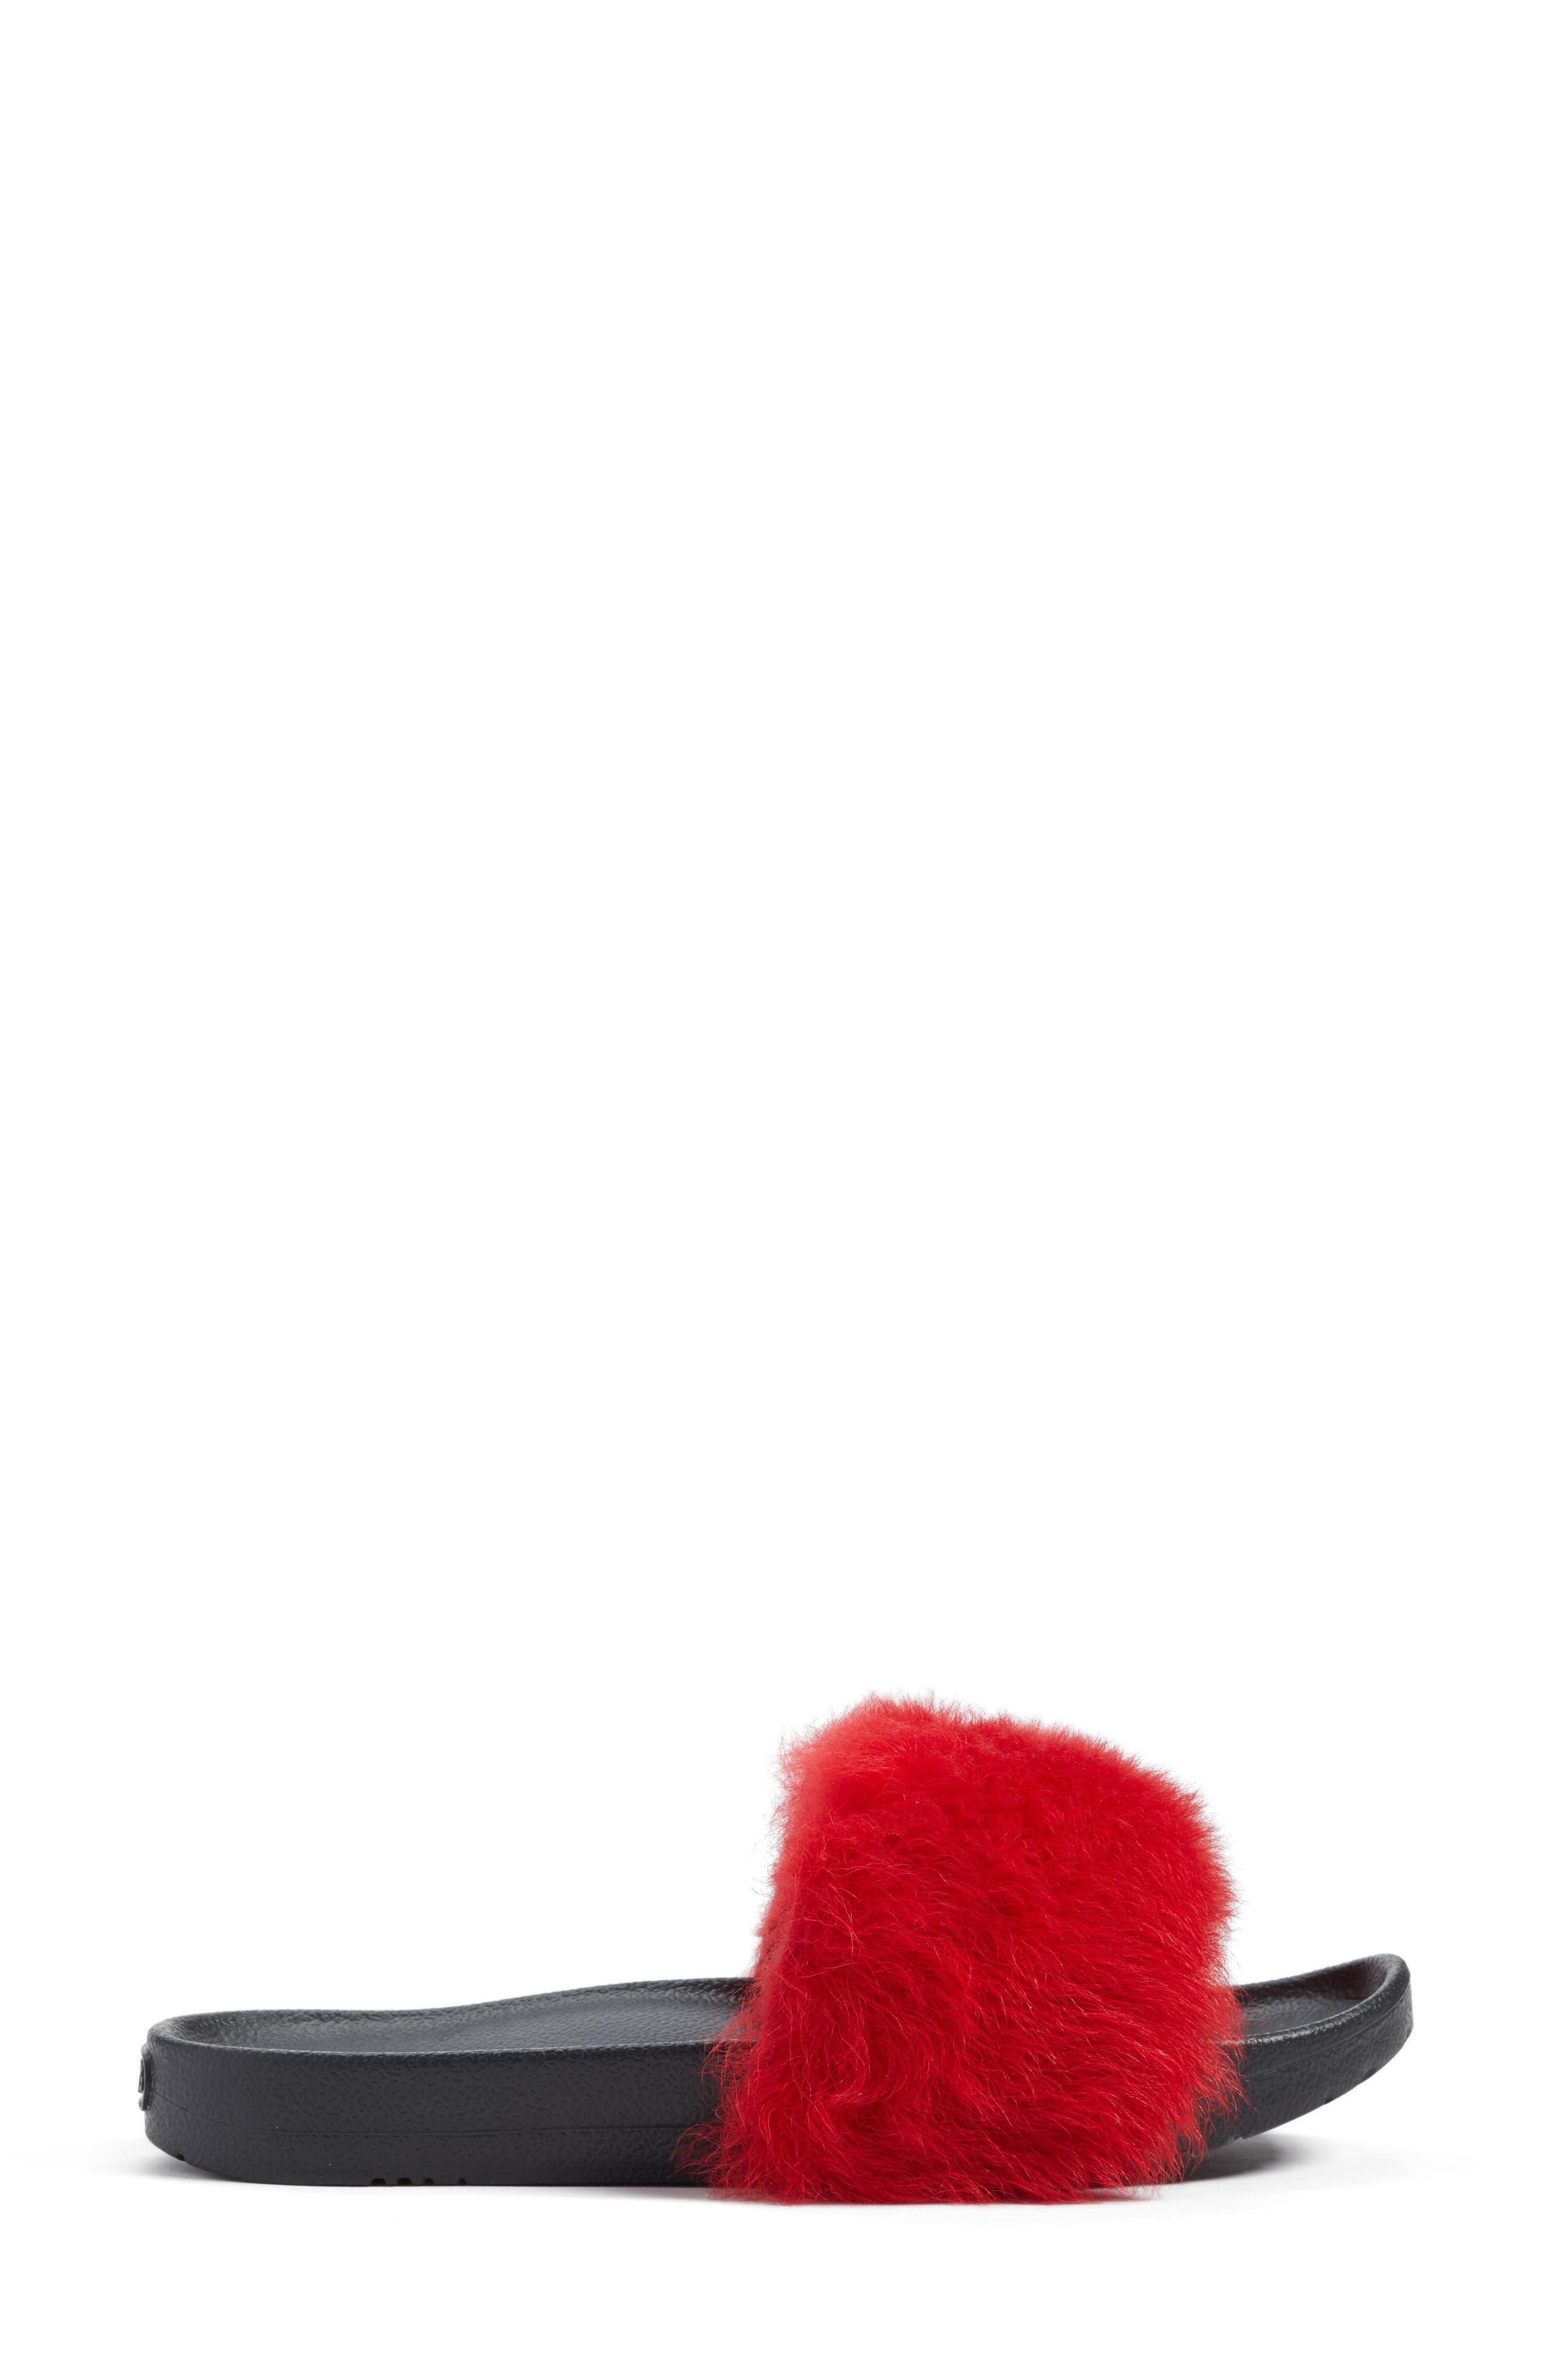 Royale Genuine Shearling Slide Sandal,                             Alternate thumbnail 3, color,                             627